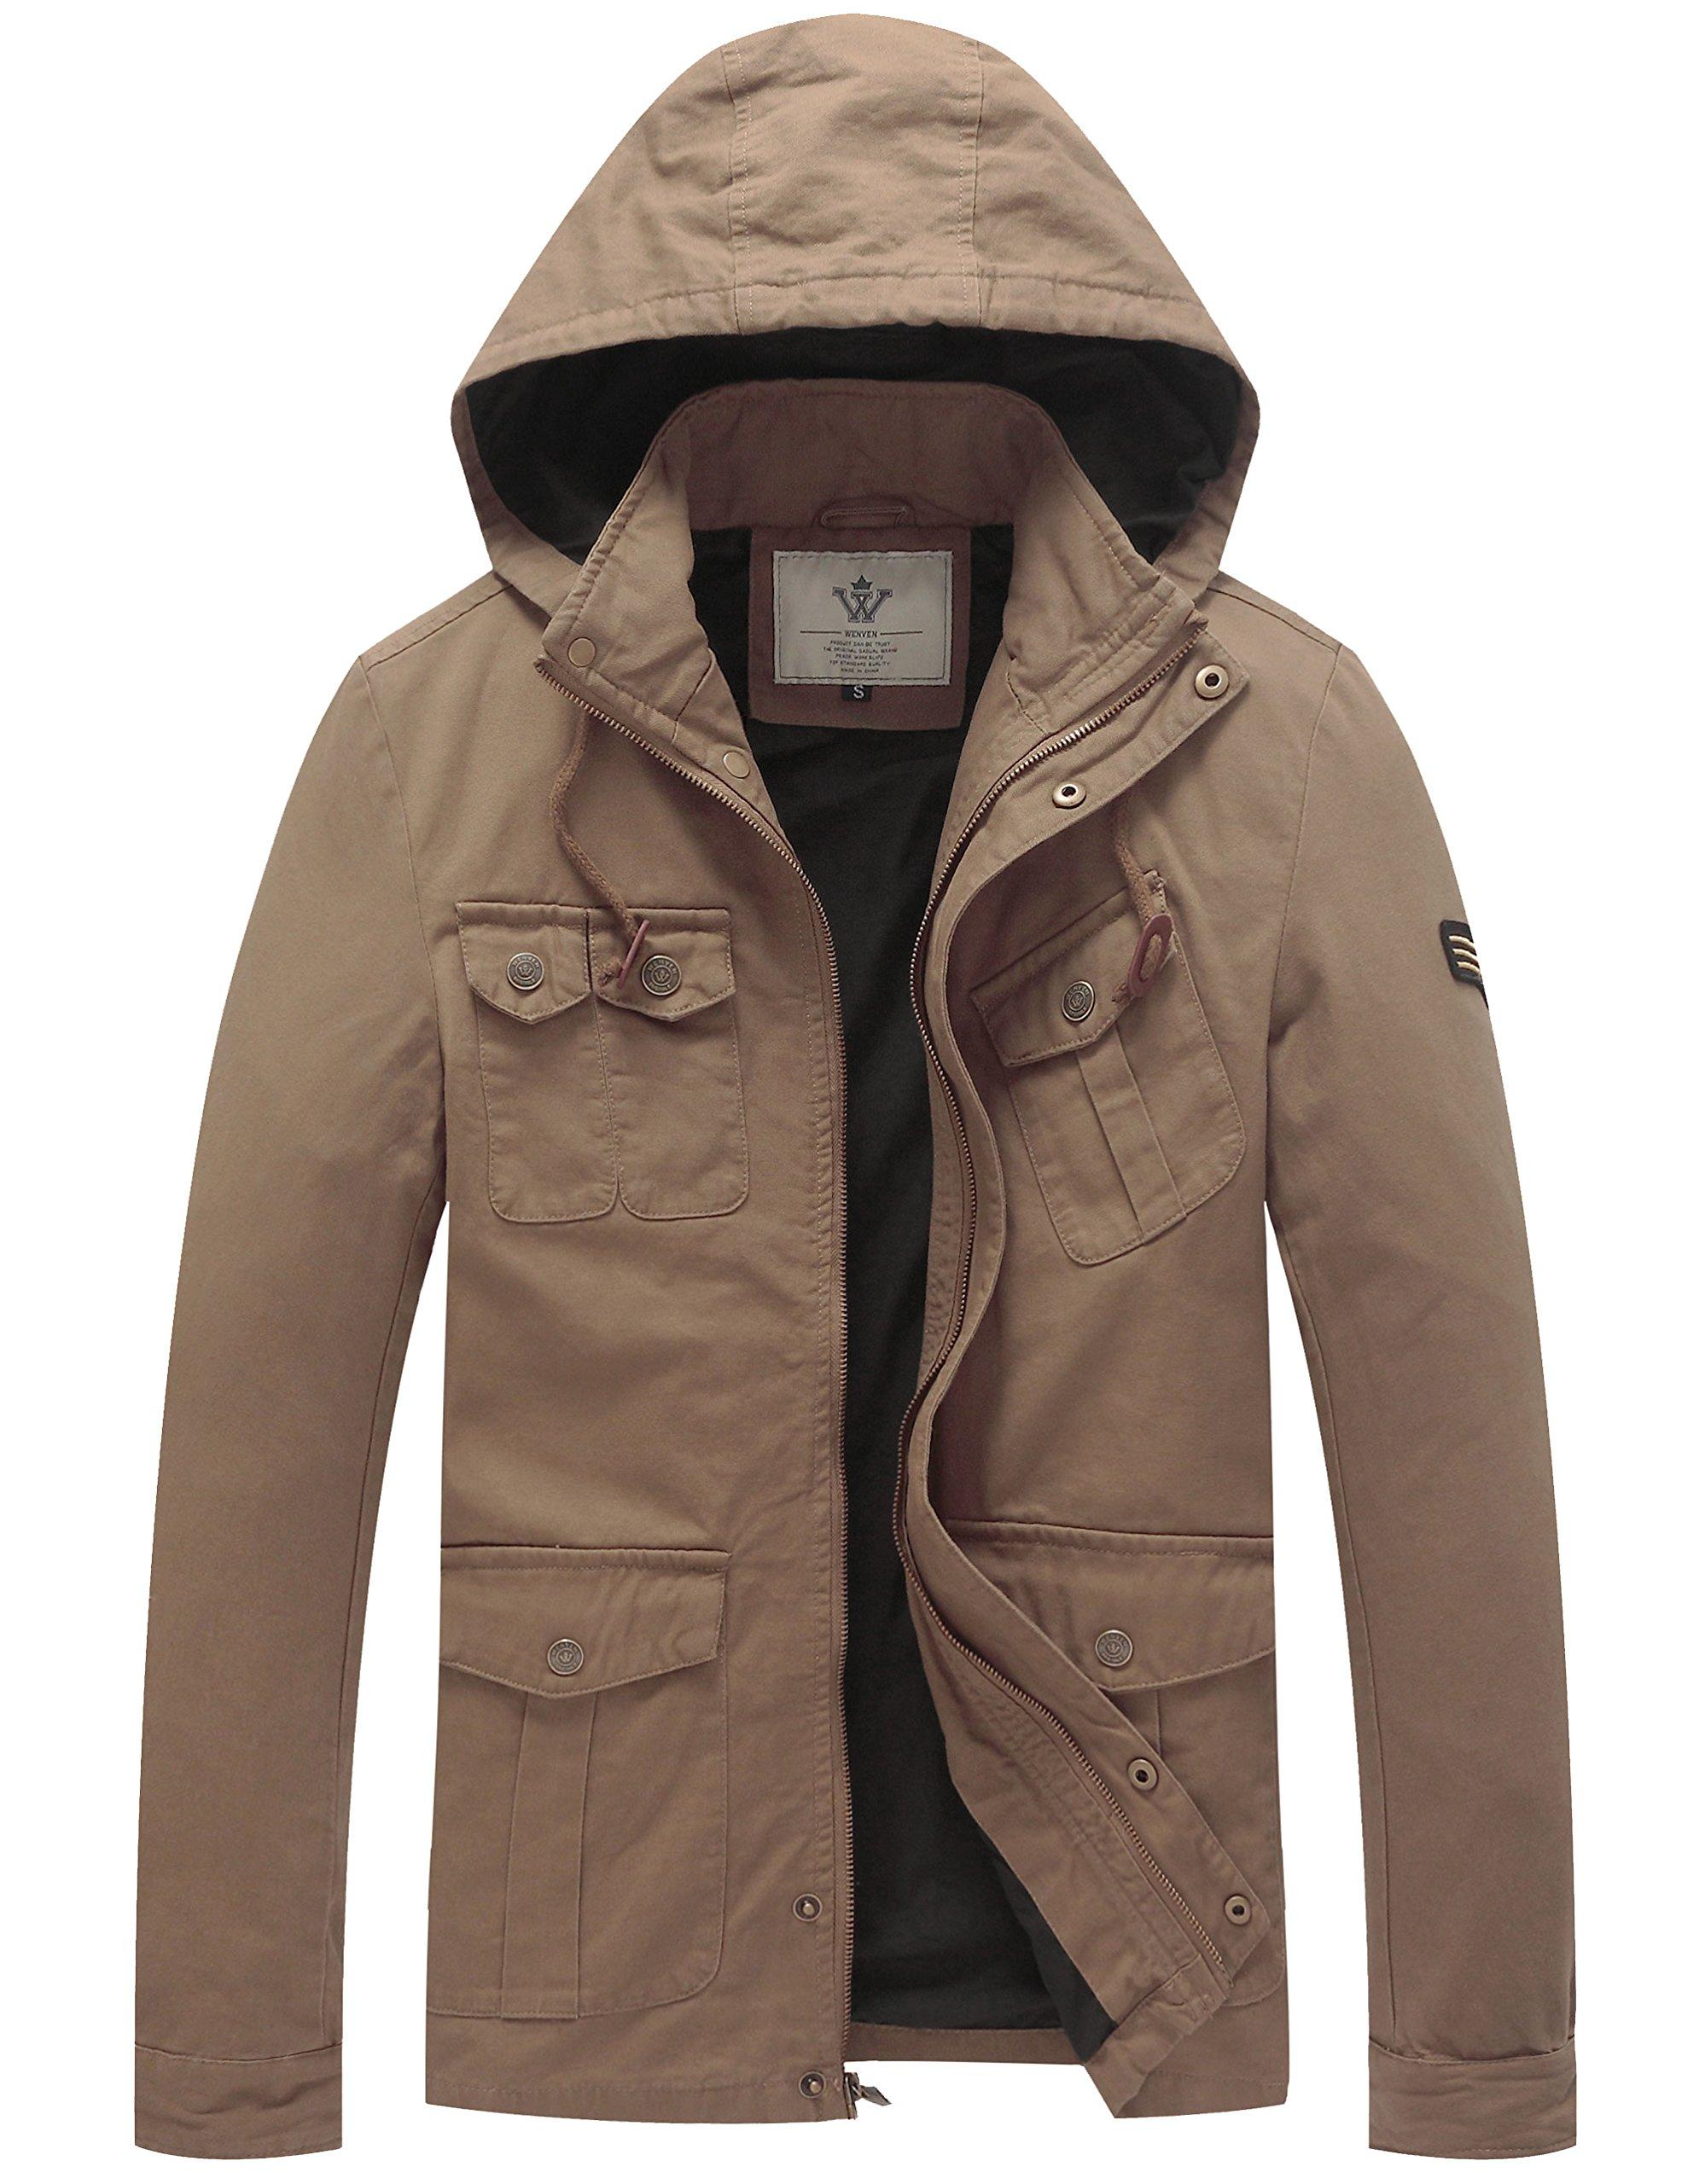 WenVen Men's Hooded Cotton Trucker Jackets (Khaki, Size M)